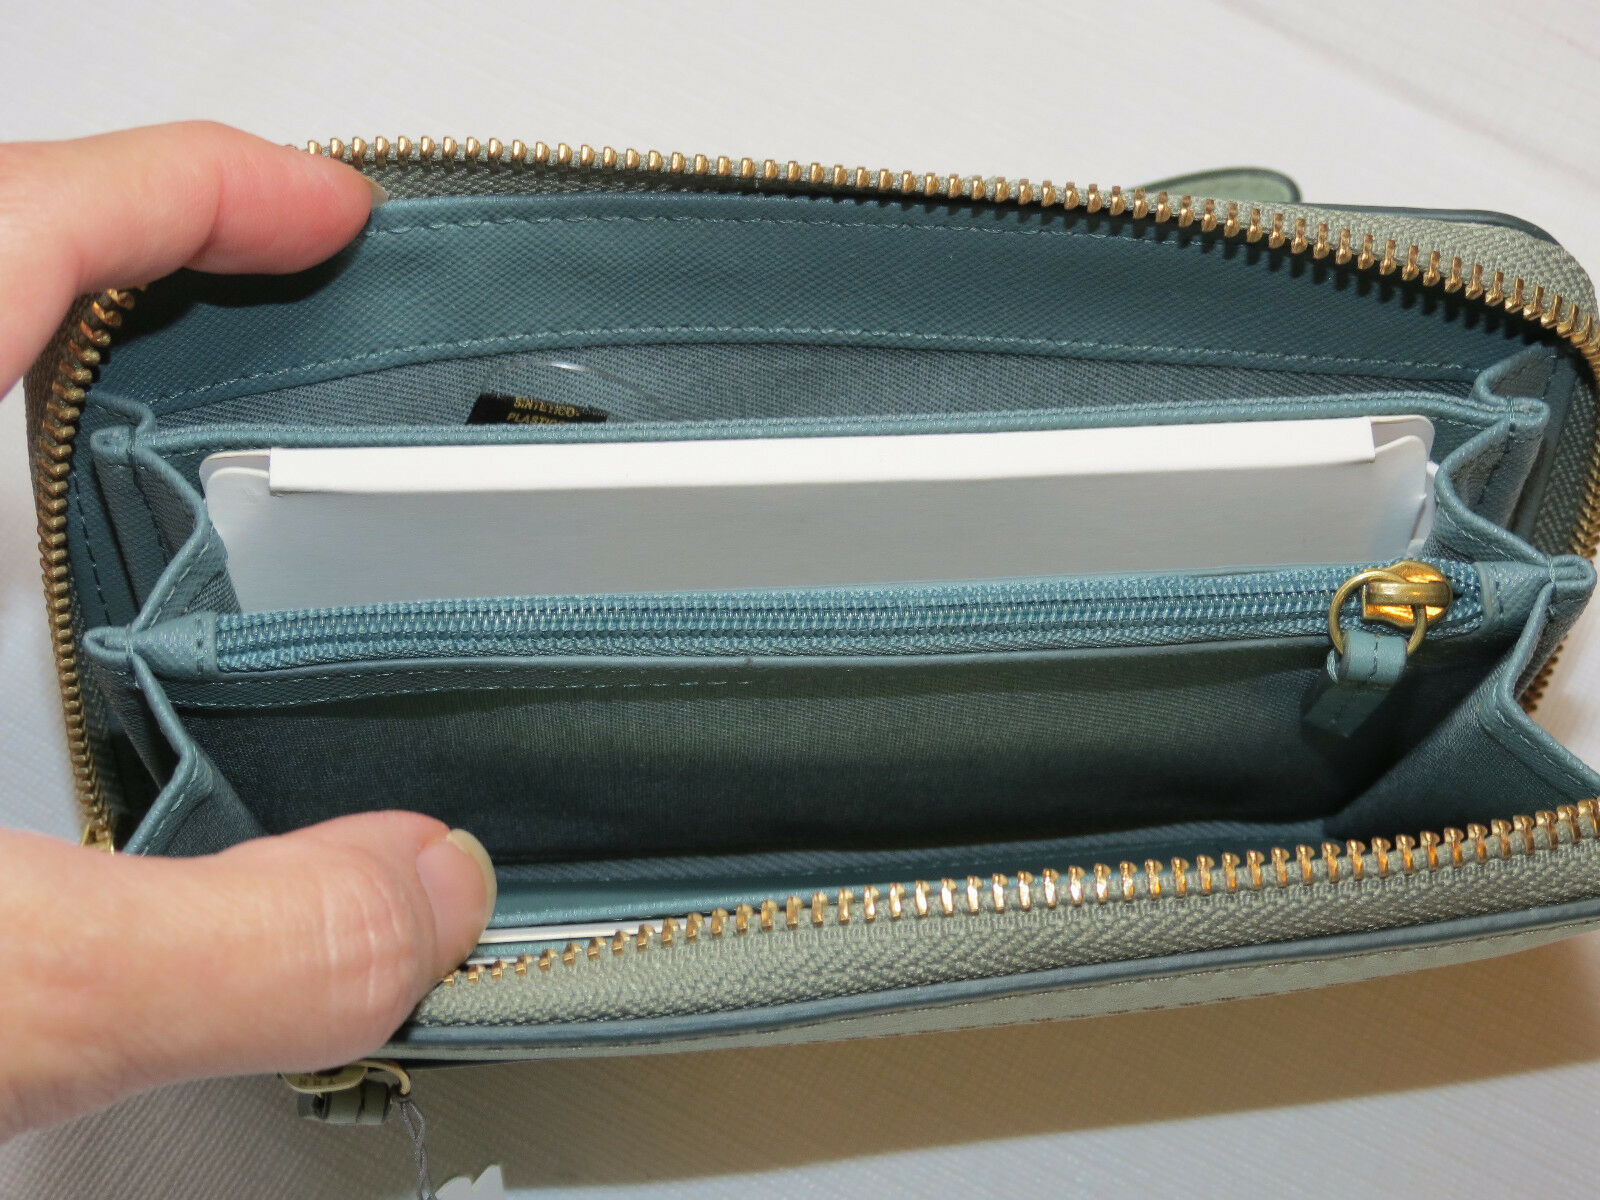 Fossil SL7151336 RFID Emma Smartphone Wristlet Lght Sage wallet clutch leather*^ image 6